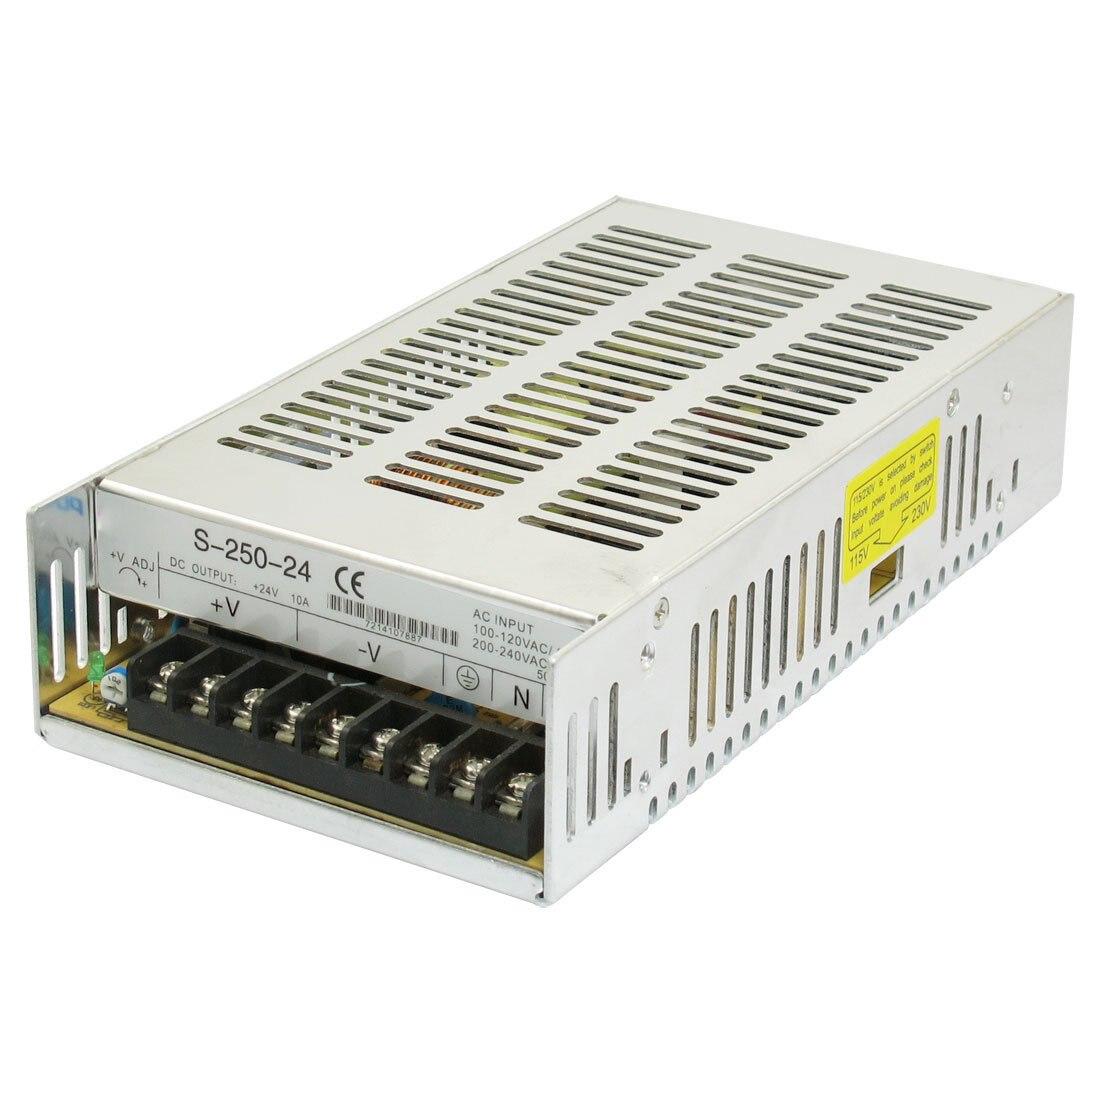 все цены на Three Output Switching Power Supply DC 24V 10A 250W for LED Light онлайн